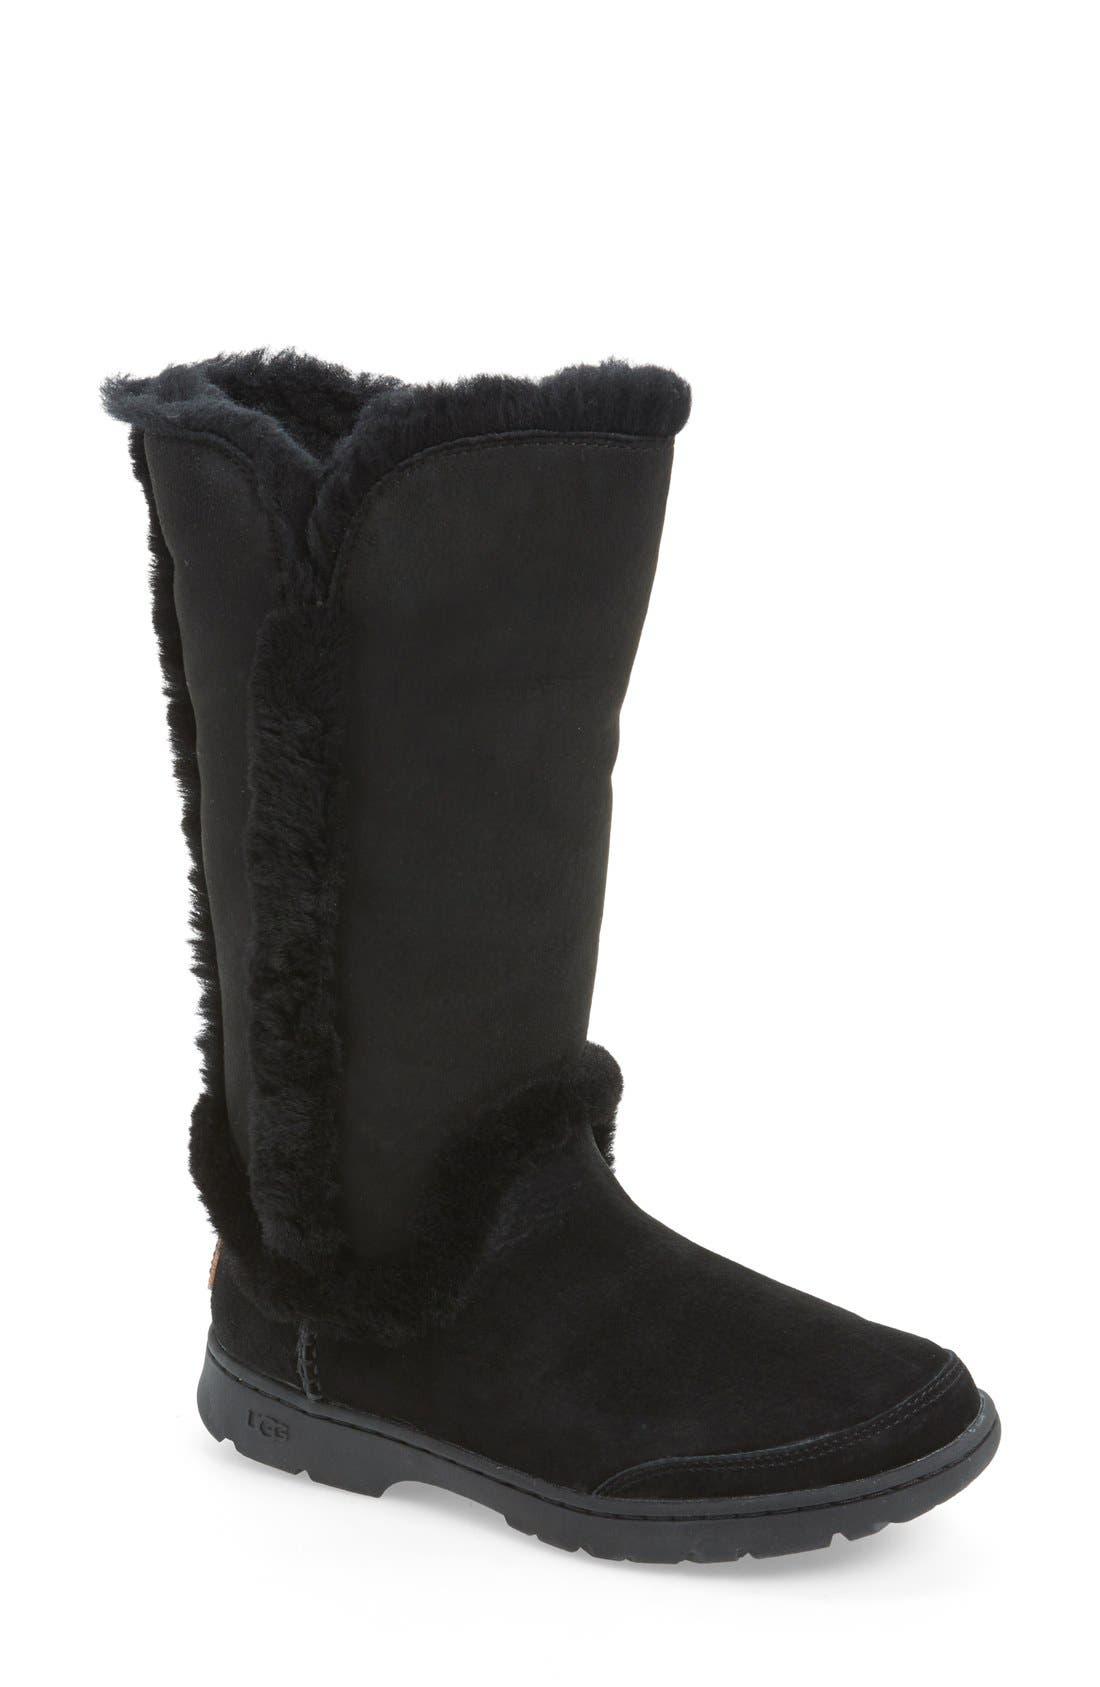 Alternate Image 1 Selected - UGG® Katia Waterproof Tall Boot (Women)